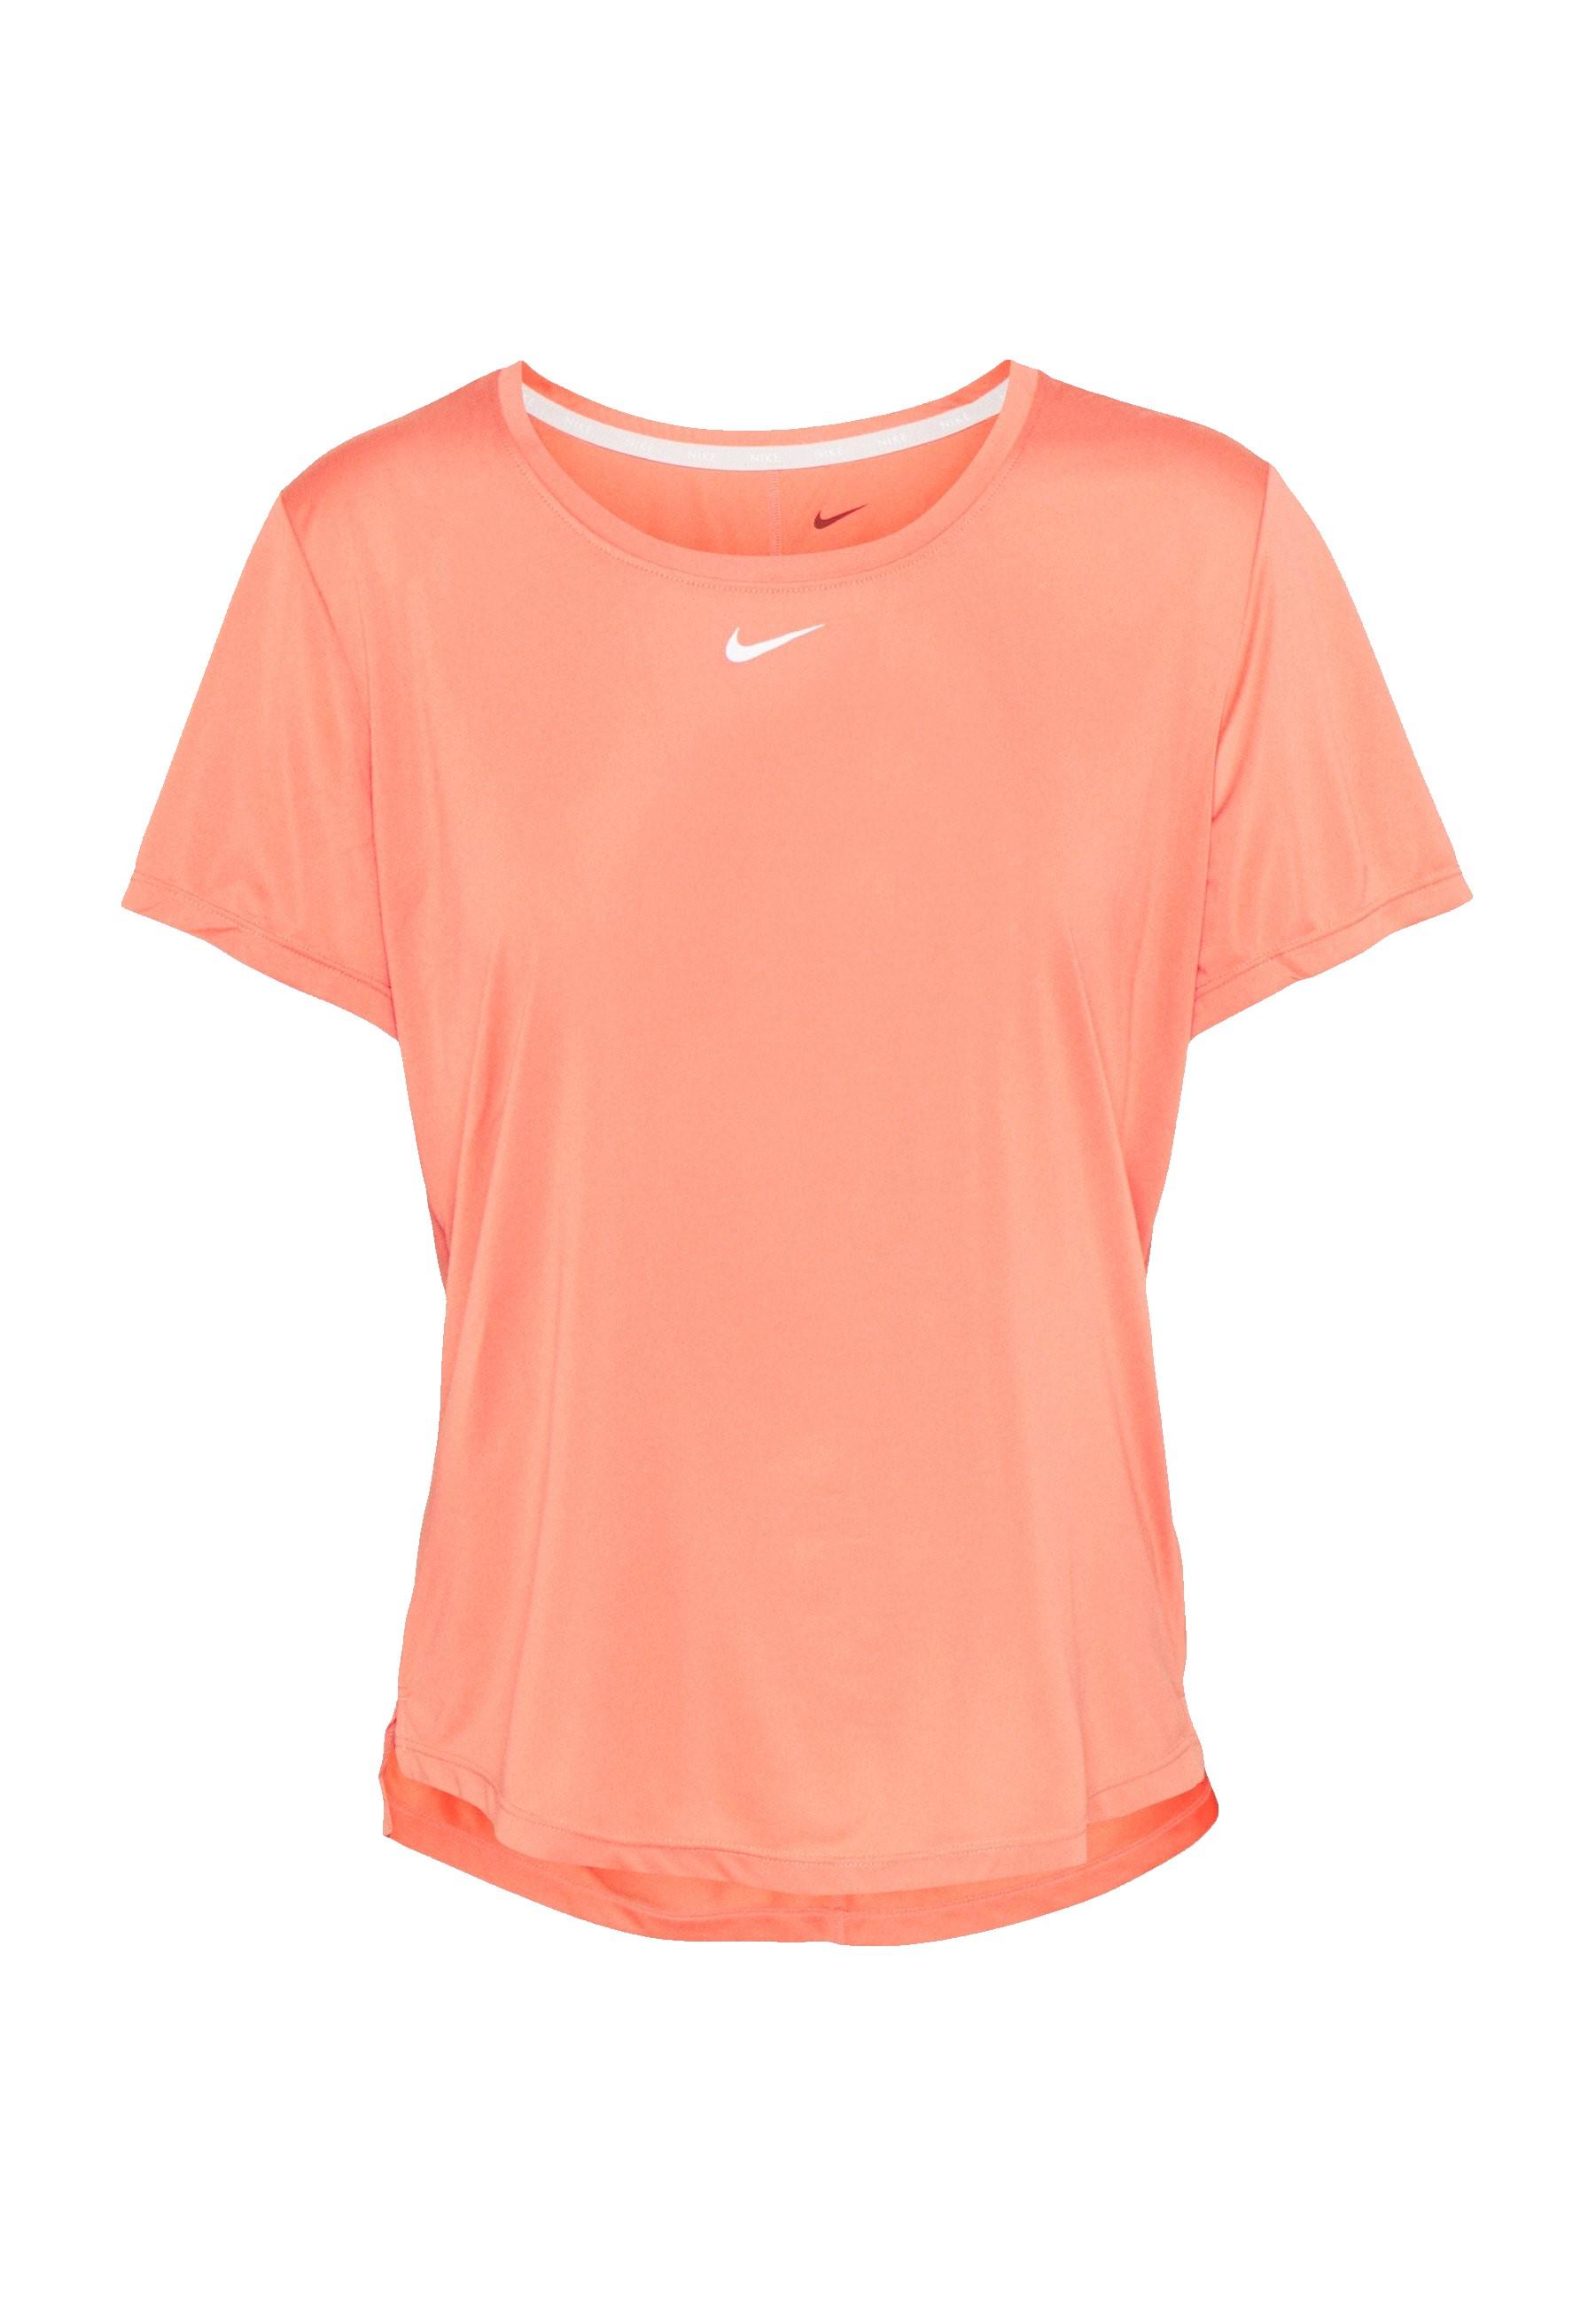 Roze/Oranje dames t-shirt Nike Dri-Fit One - DD0638-814